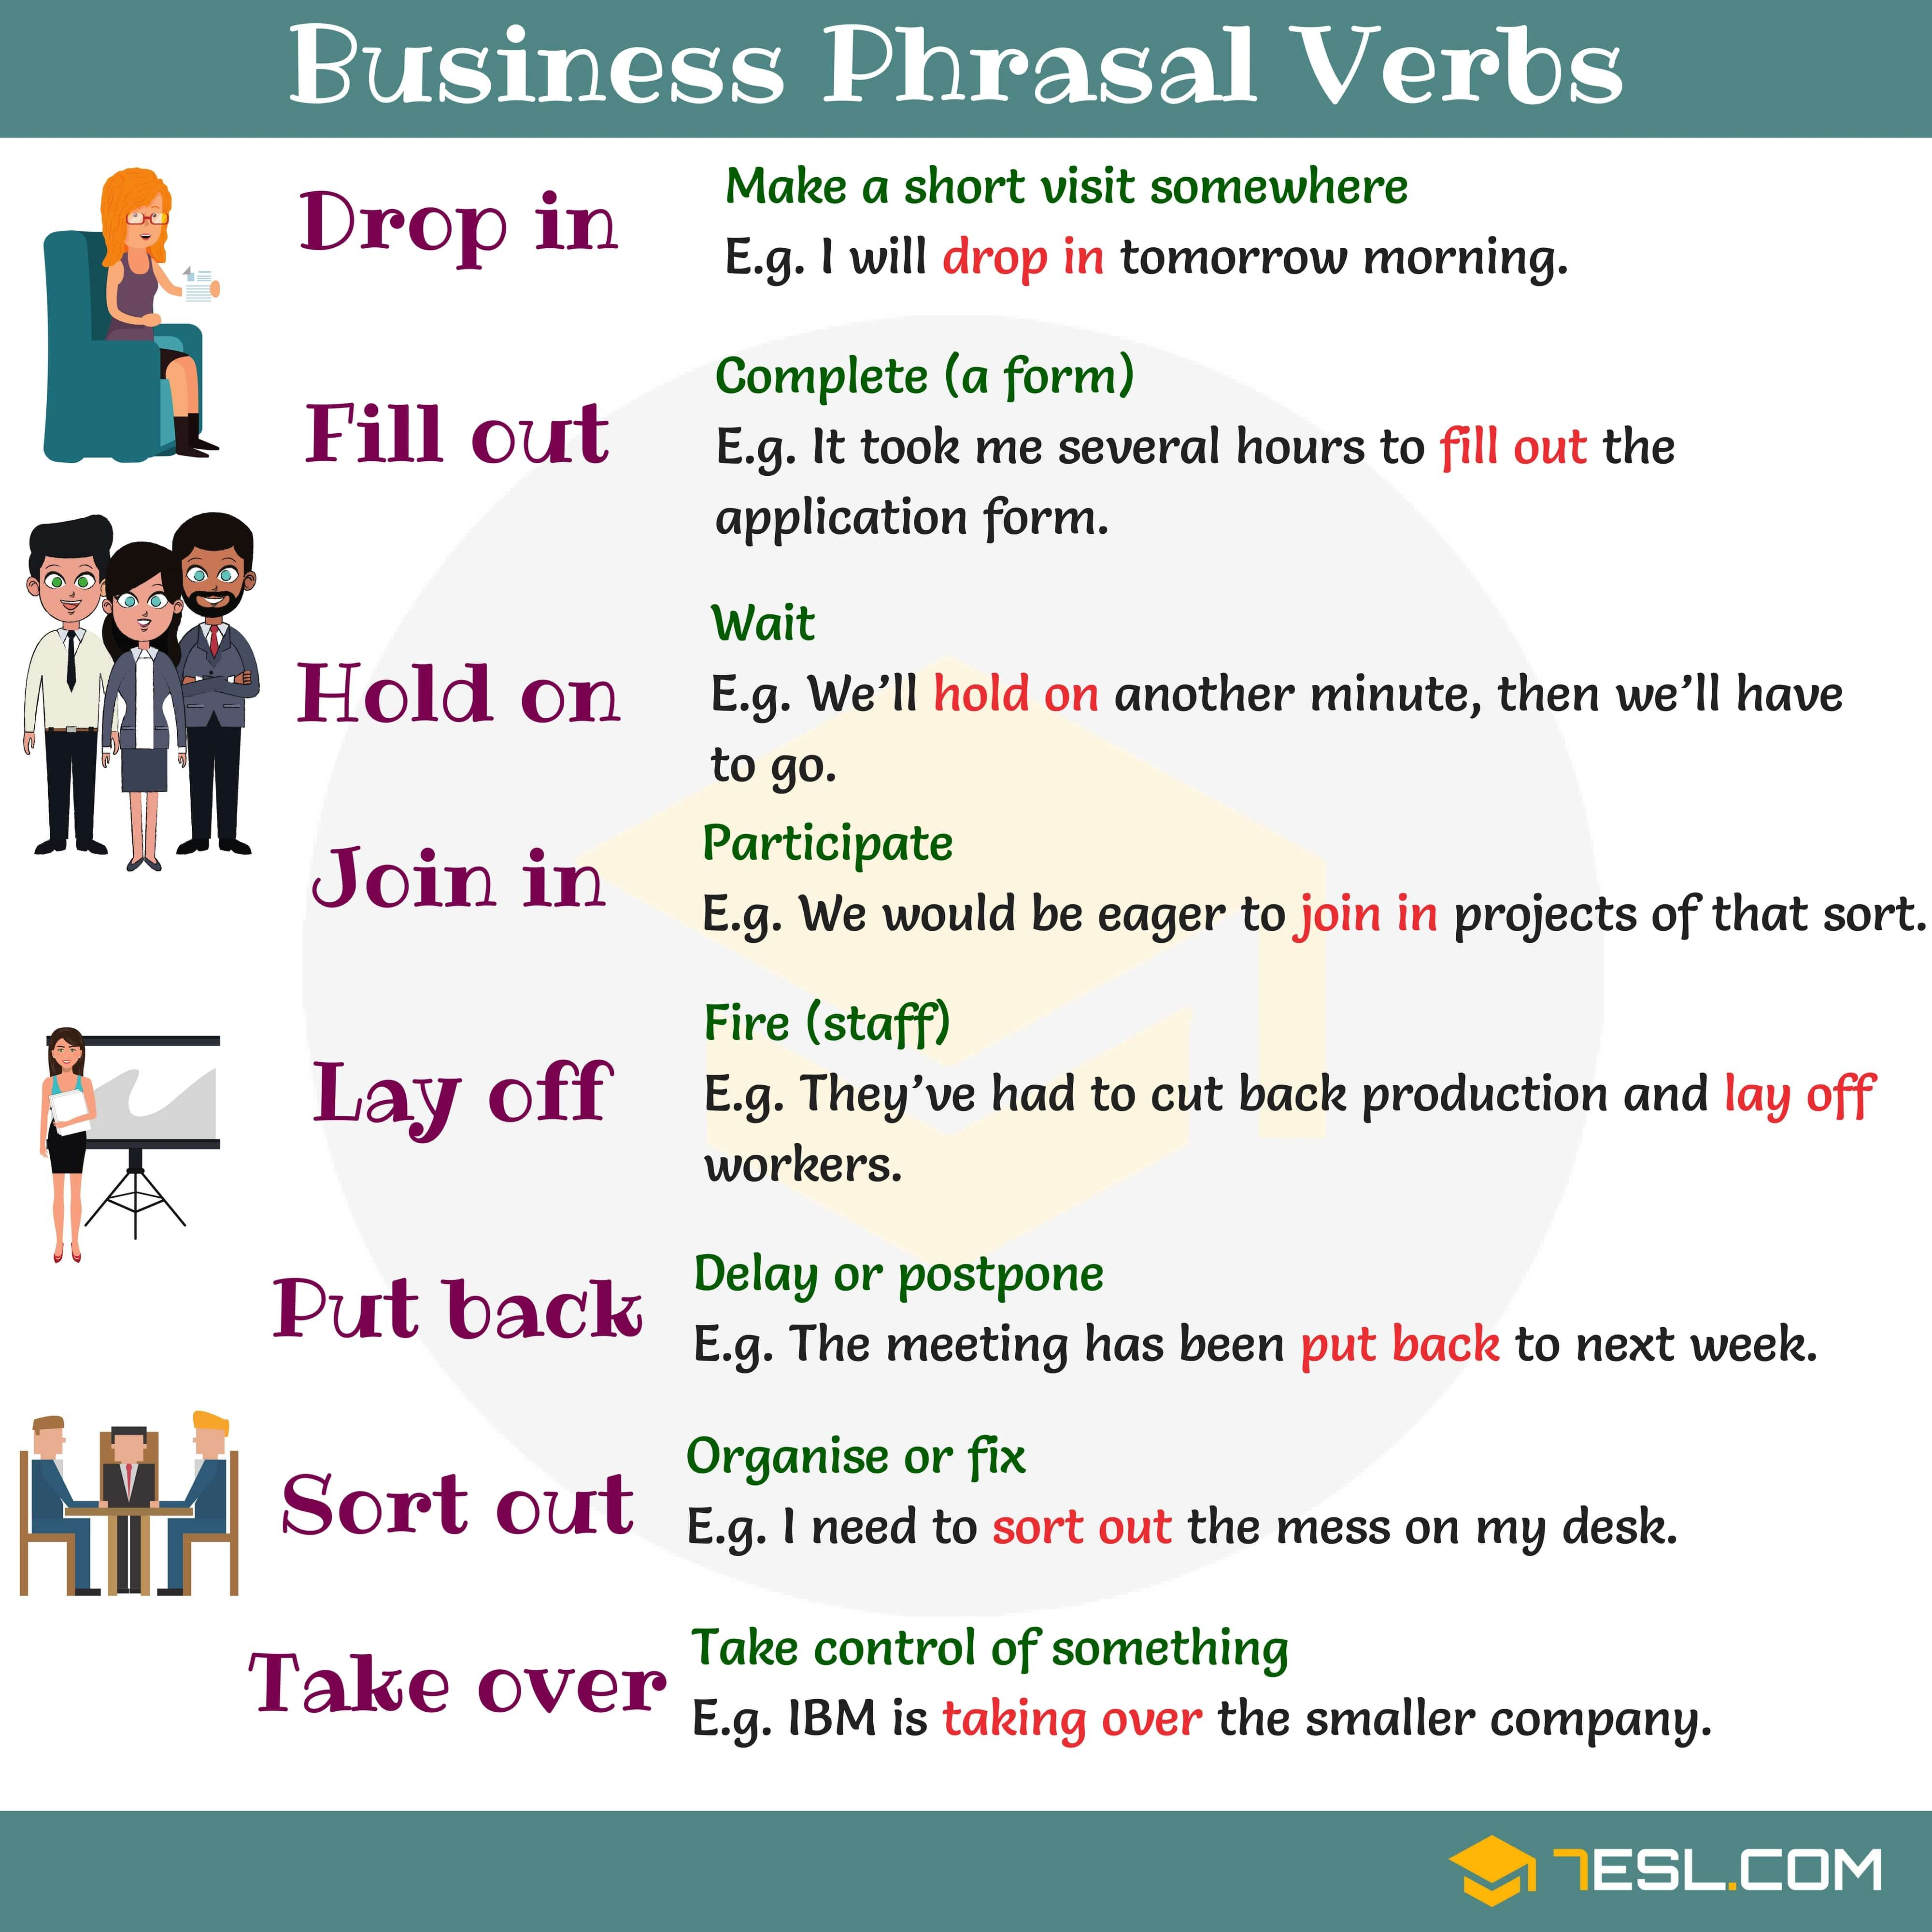 38 Useful Business Phrasal Verbs in English | Englisch lernen ...